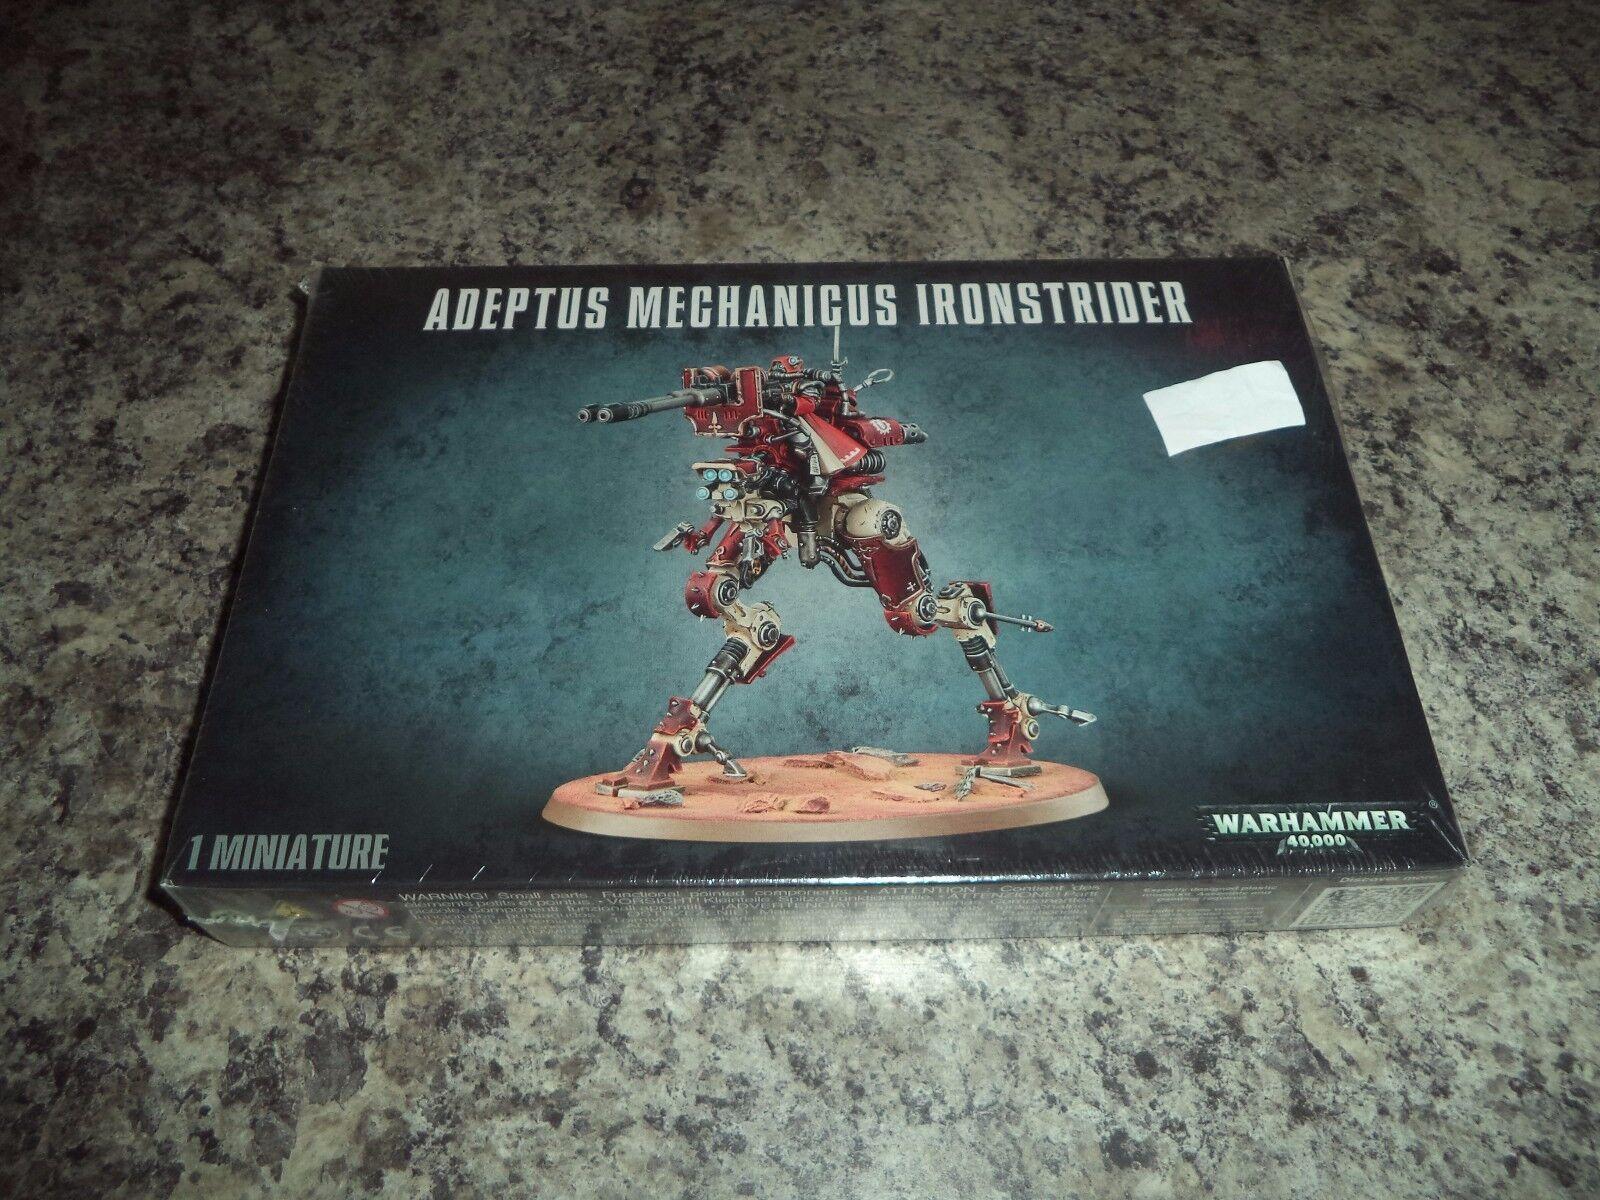 Adeptus Mechanicus ironstrider-Warhammer 40k Modelo 40,000  nuevo